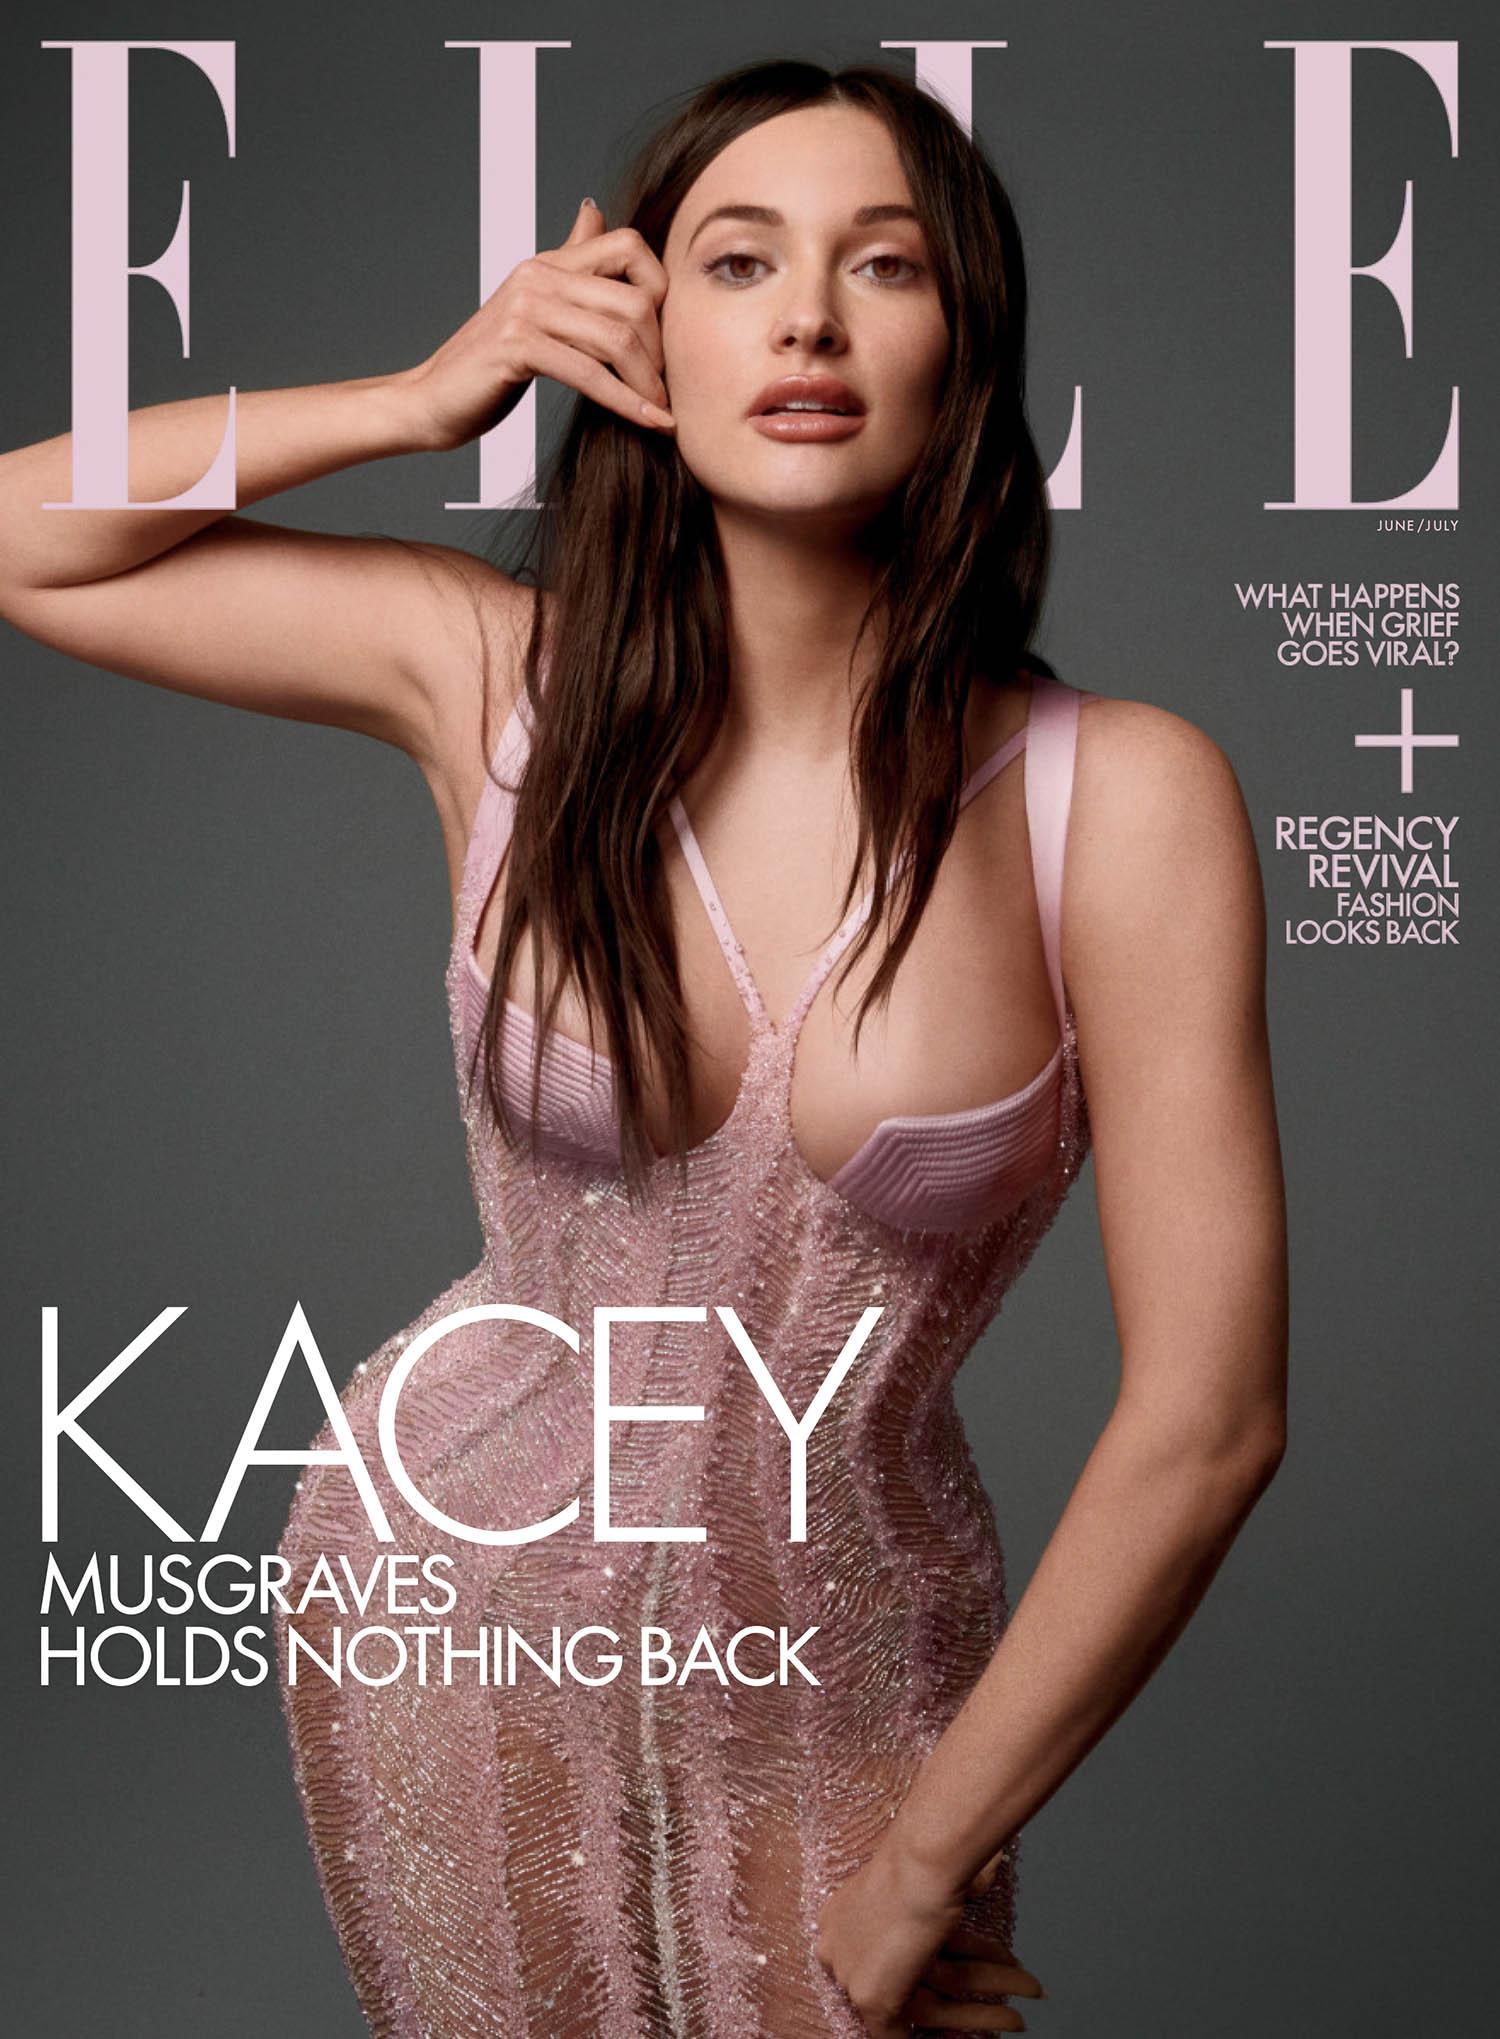 Kacey Musgraves covers Elle US June July 2021 by Cass Bird